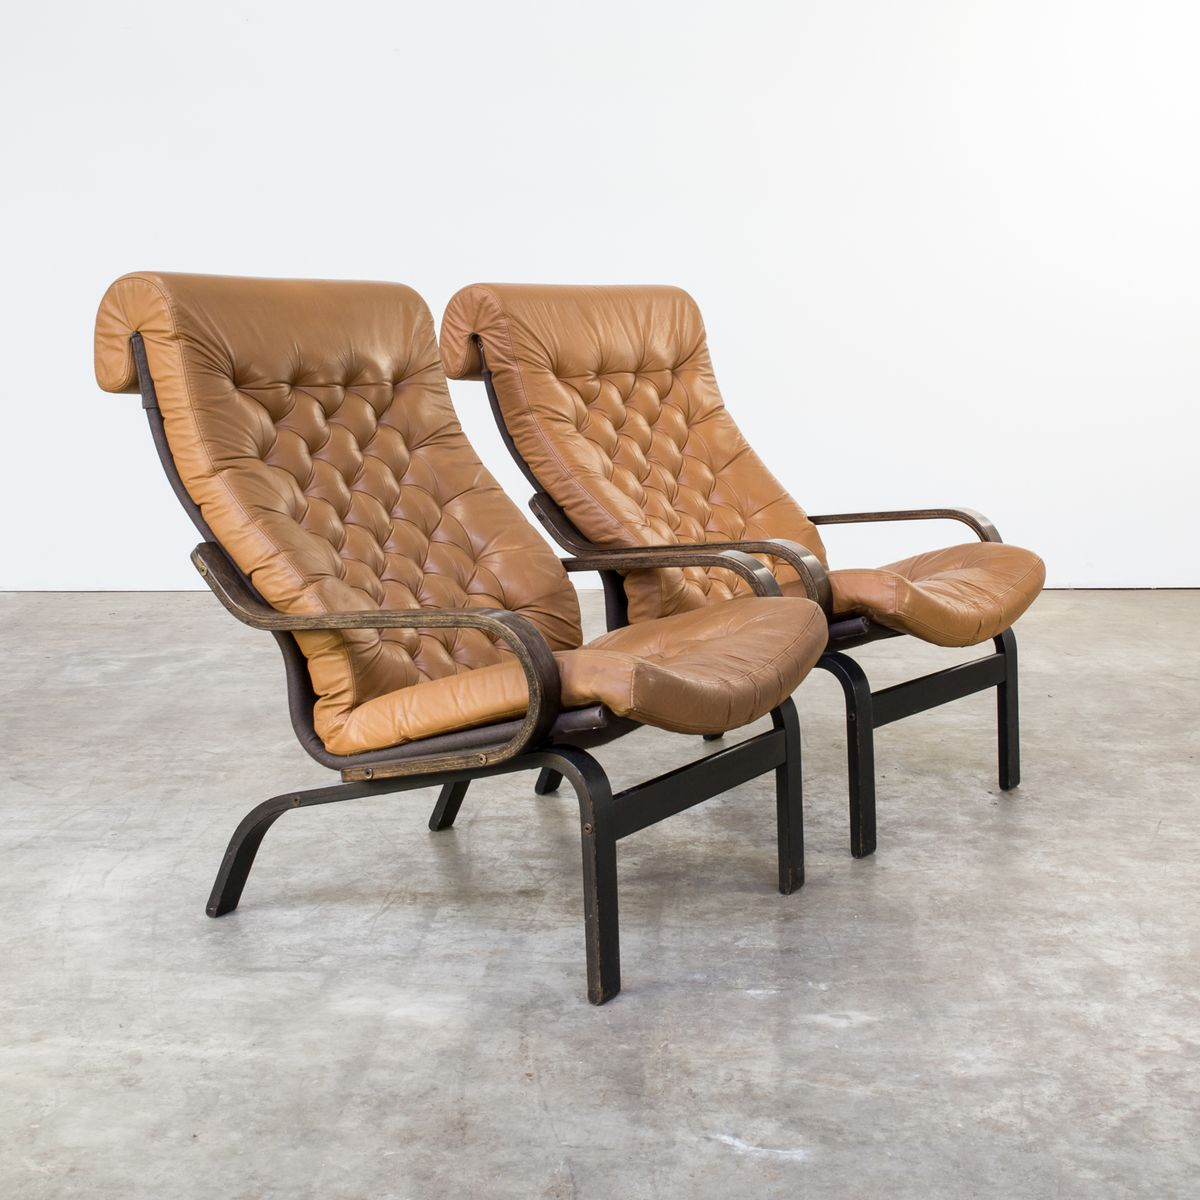 skandinavische wenge cognacfarbene ledersessel mit ottomanen 1970er bei pamono kaufen. Black Bedroom Furniture Sets. Home Design Ideas